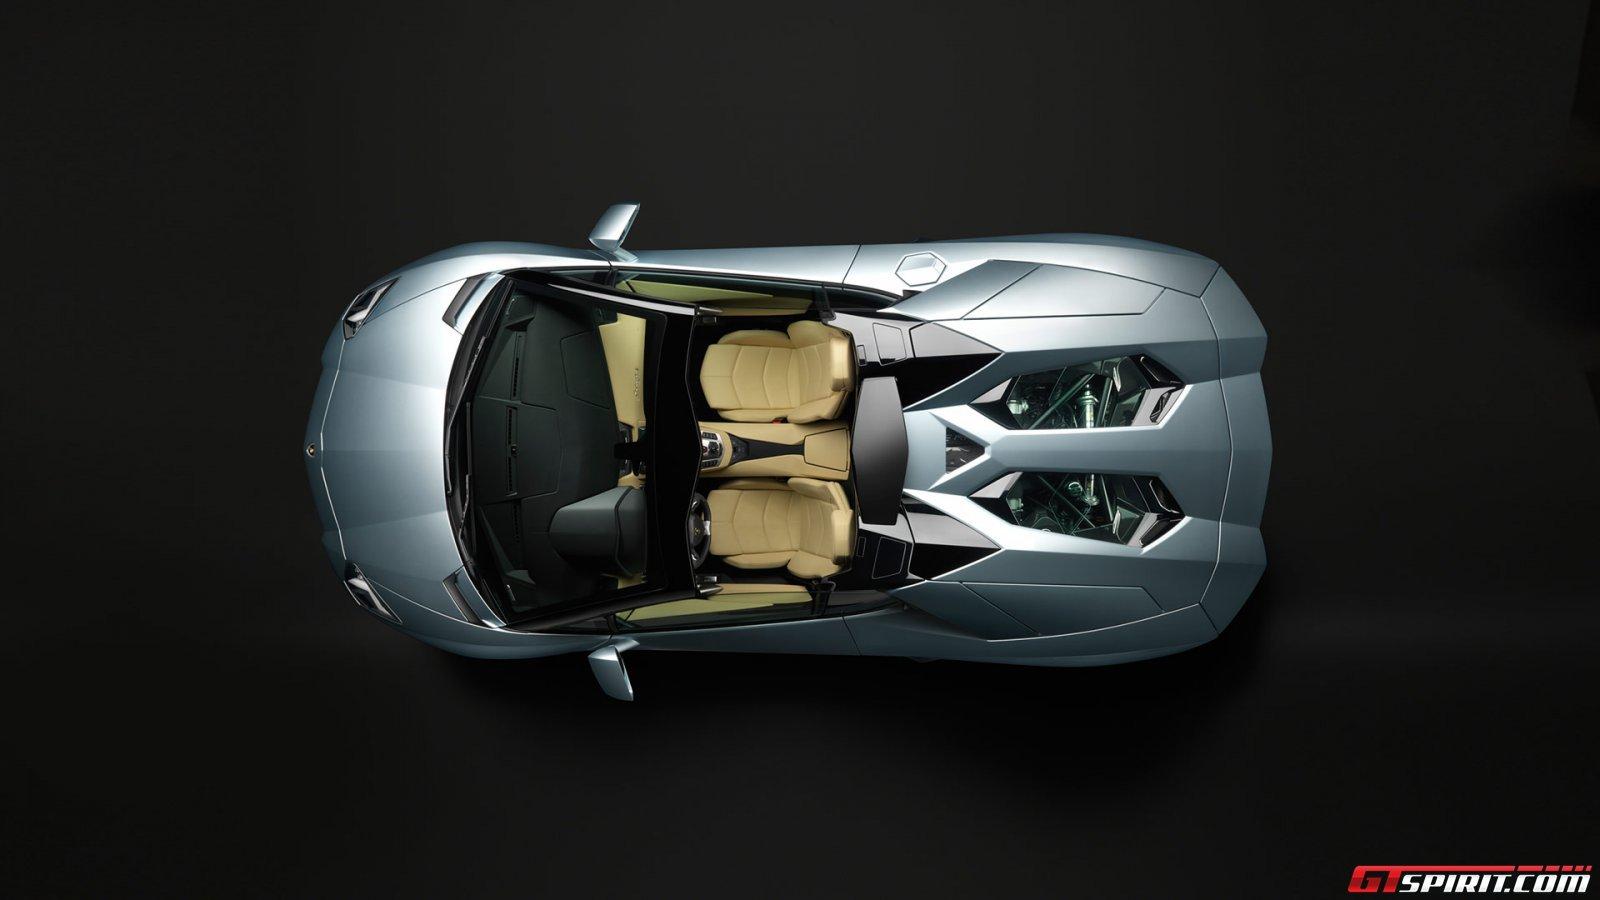 2013 Lamborghini Aventador LP700-4 Roadster Photo 4